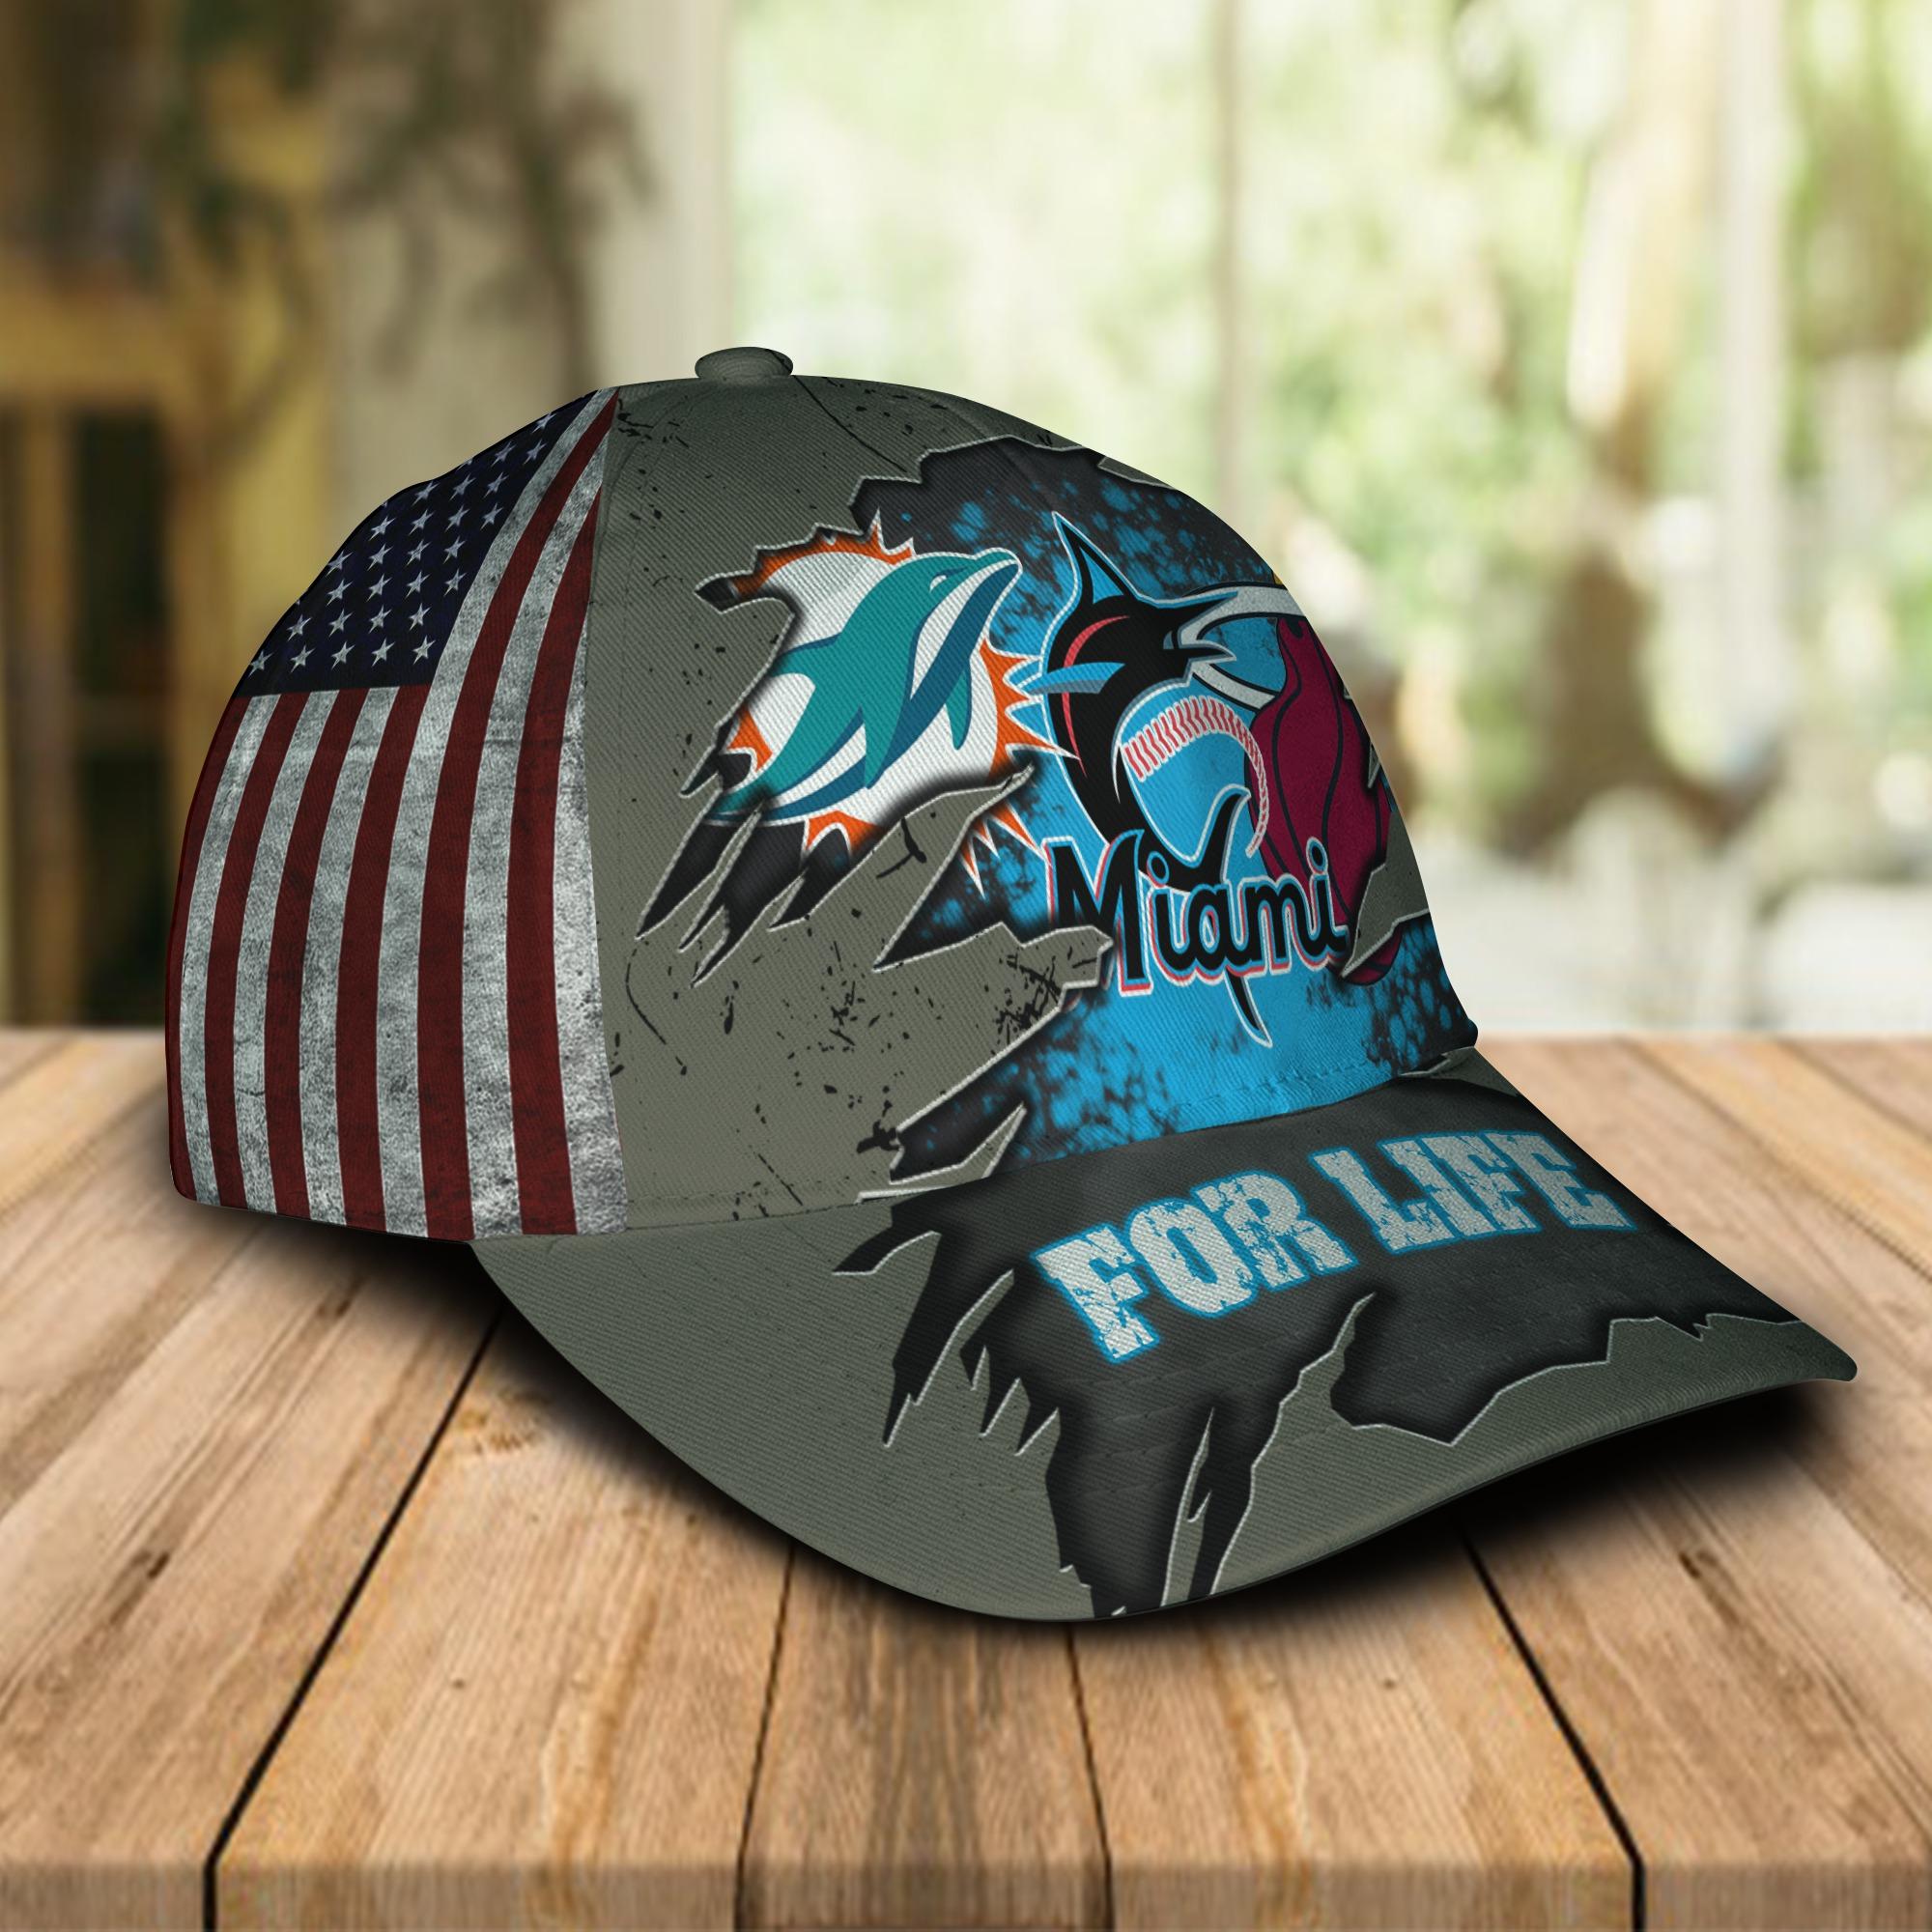 Miami Dolphins Miami Marlins Miami Heat For Life Cap 1